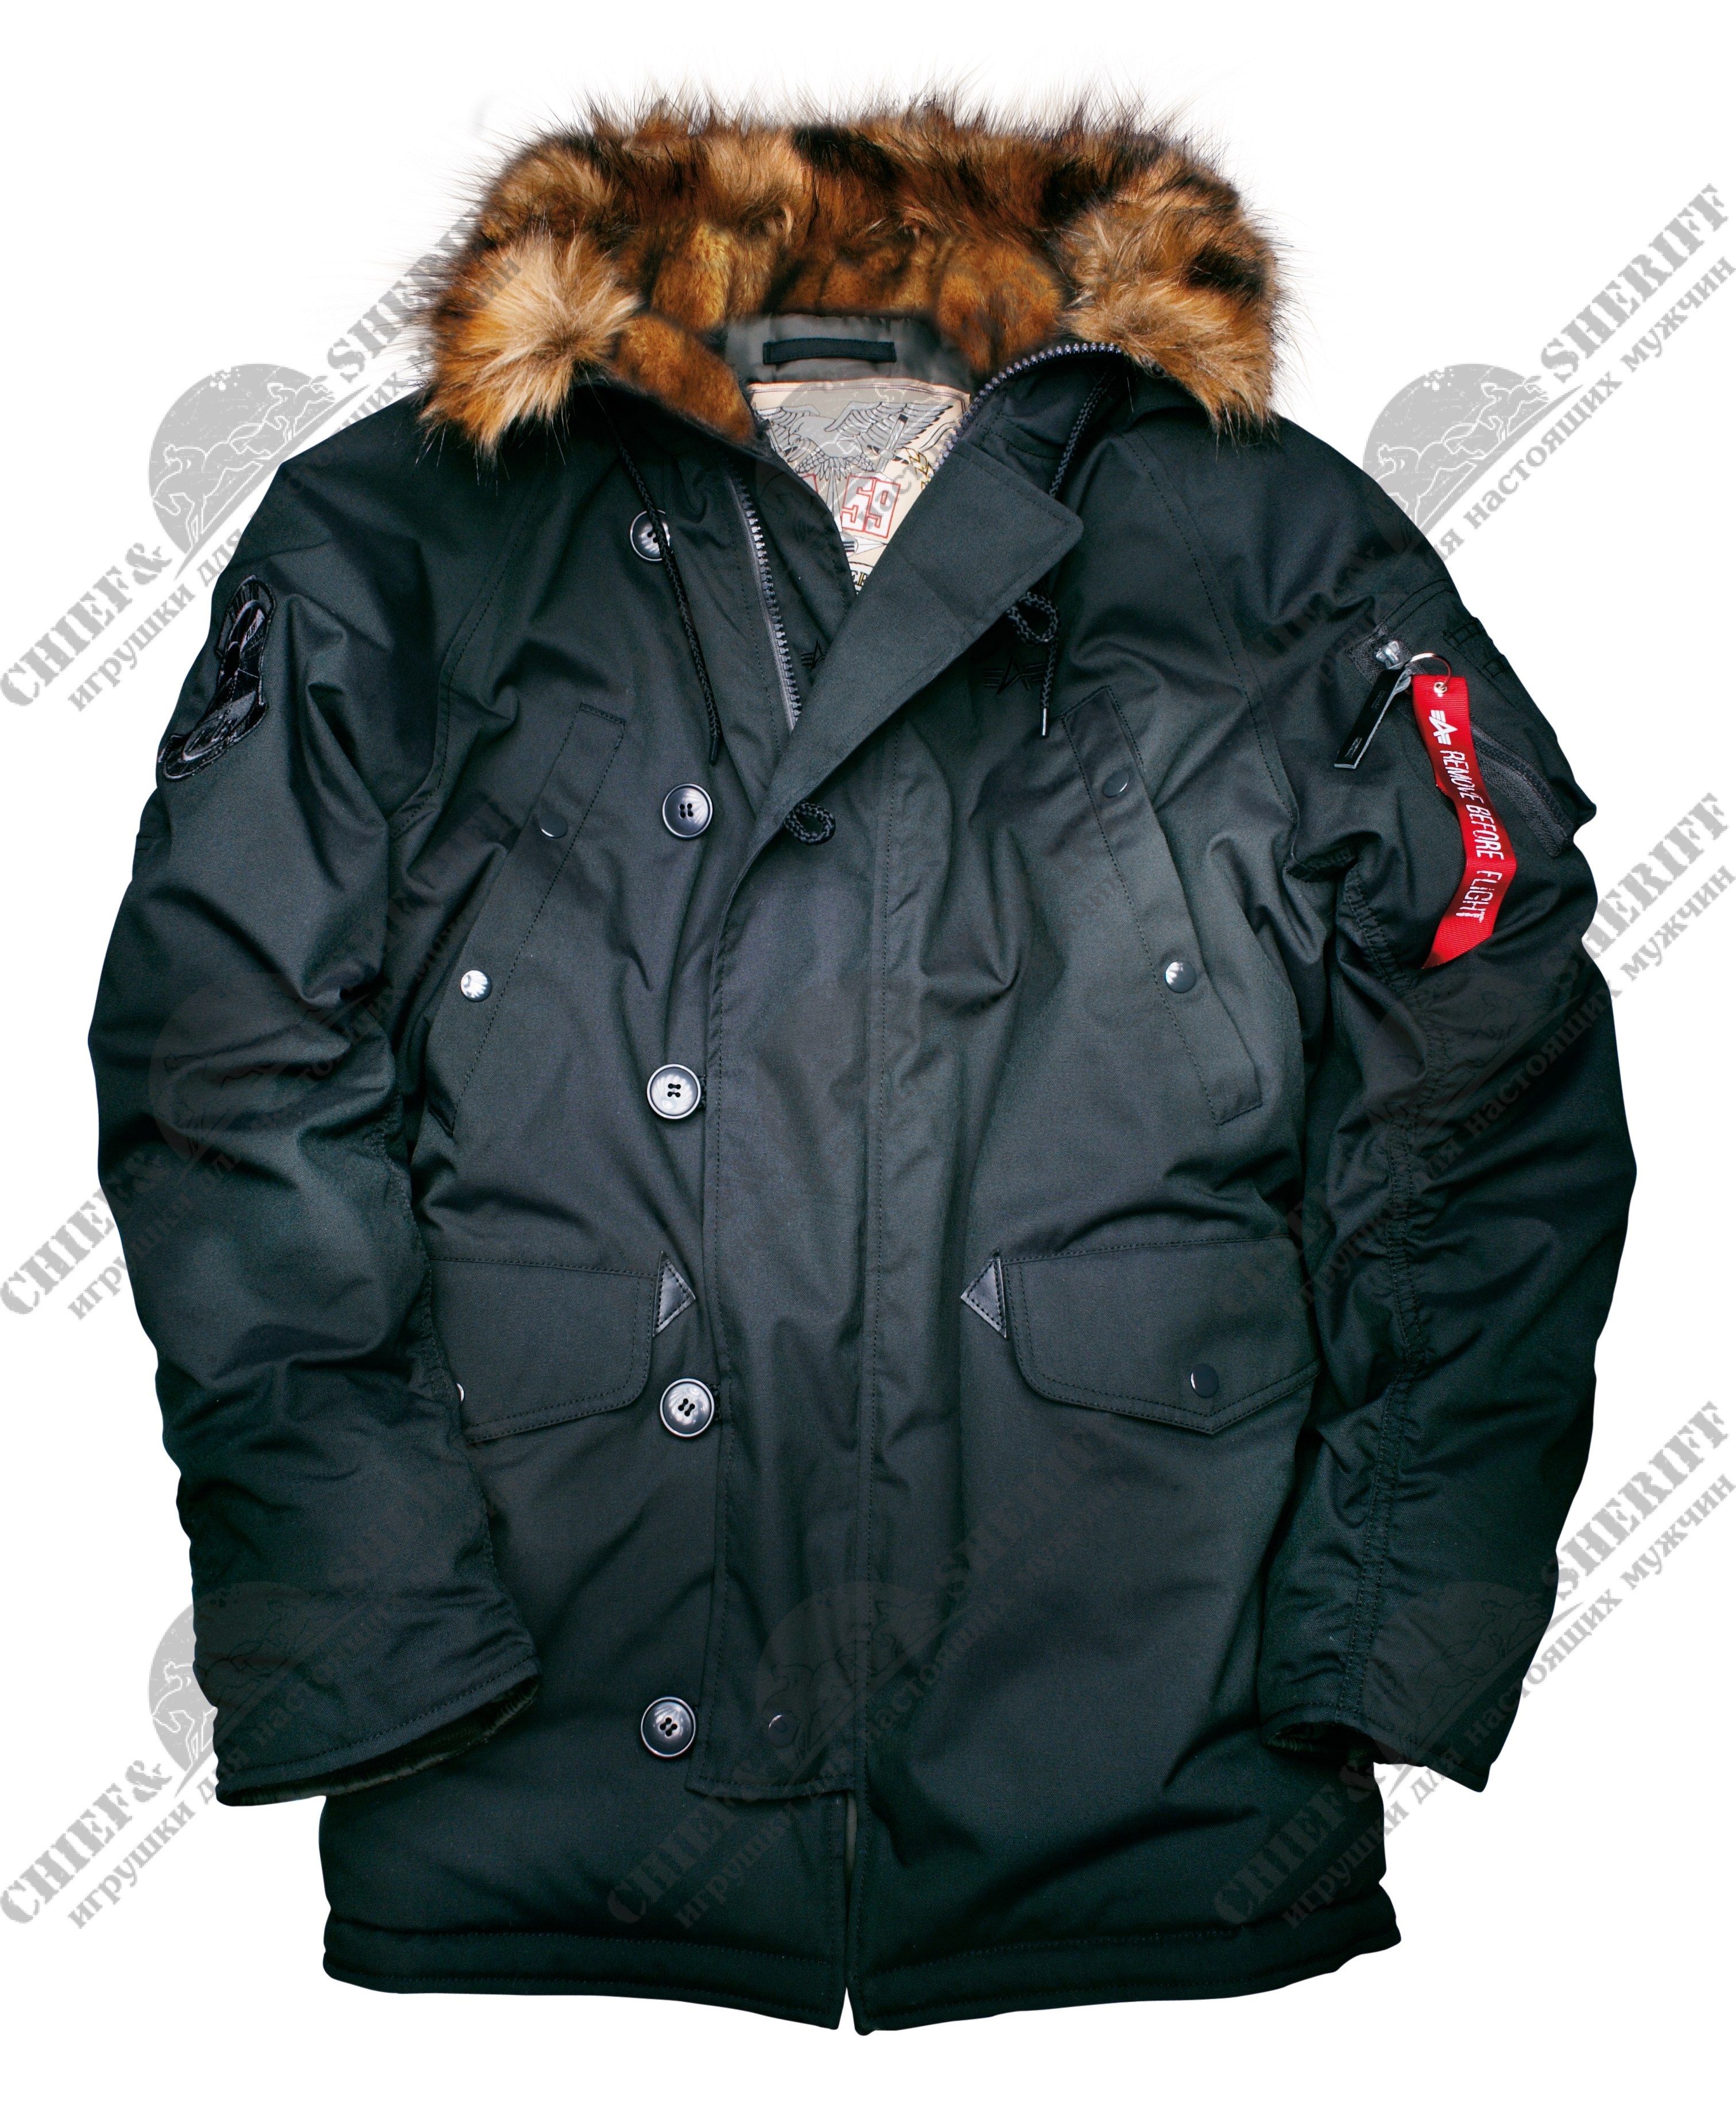 0bbe1f4c Куртка аляска Alpha Industries Explorer, black цена 9 240 р купить с ...